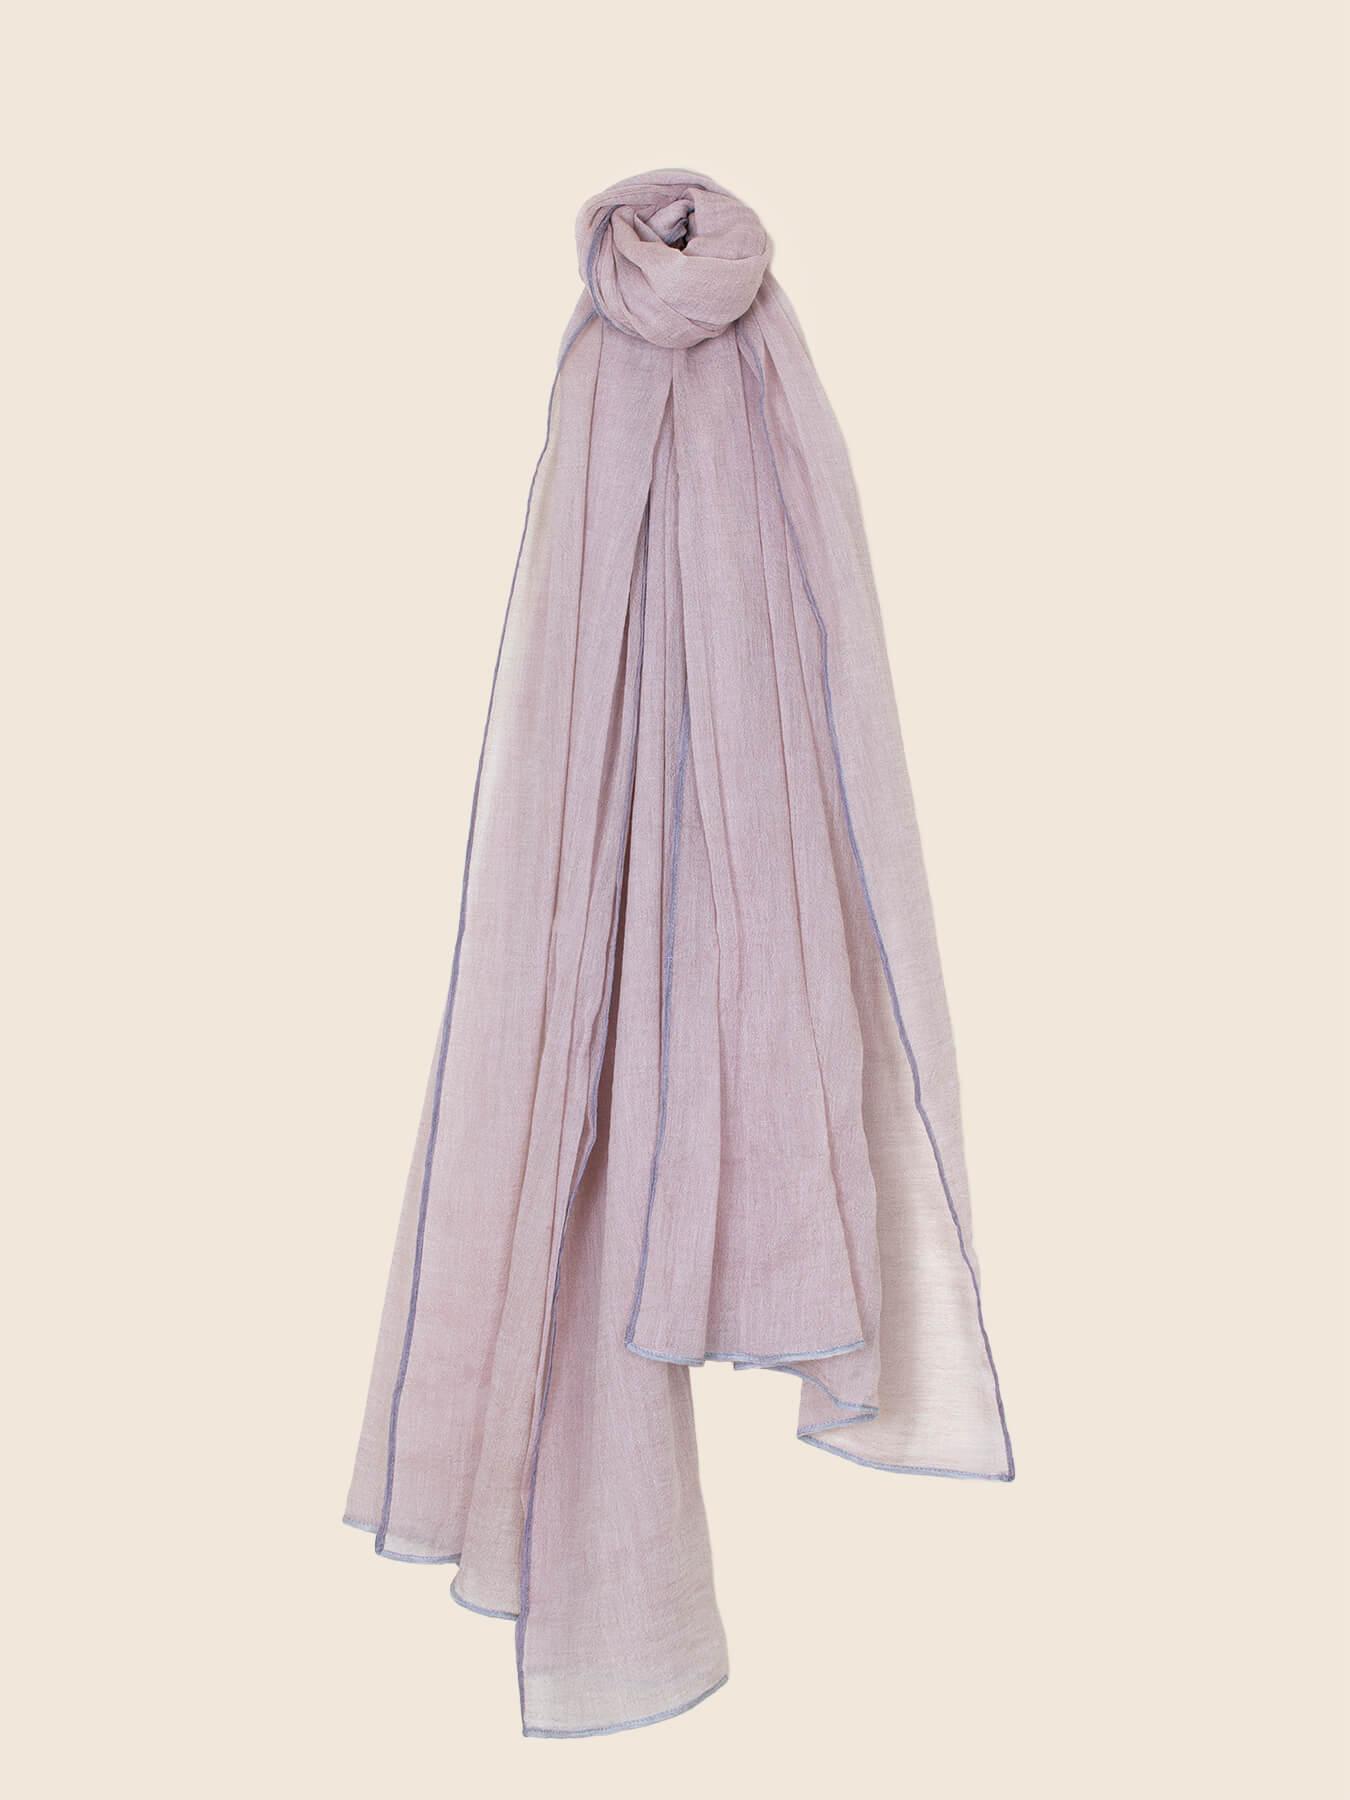 Crepe Wool Shawl Rose Ash 2